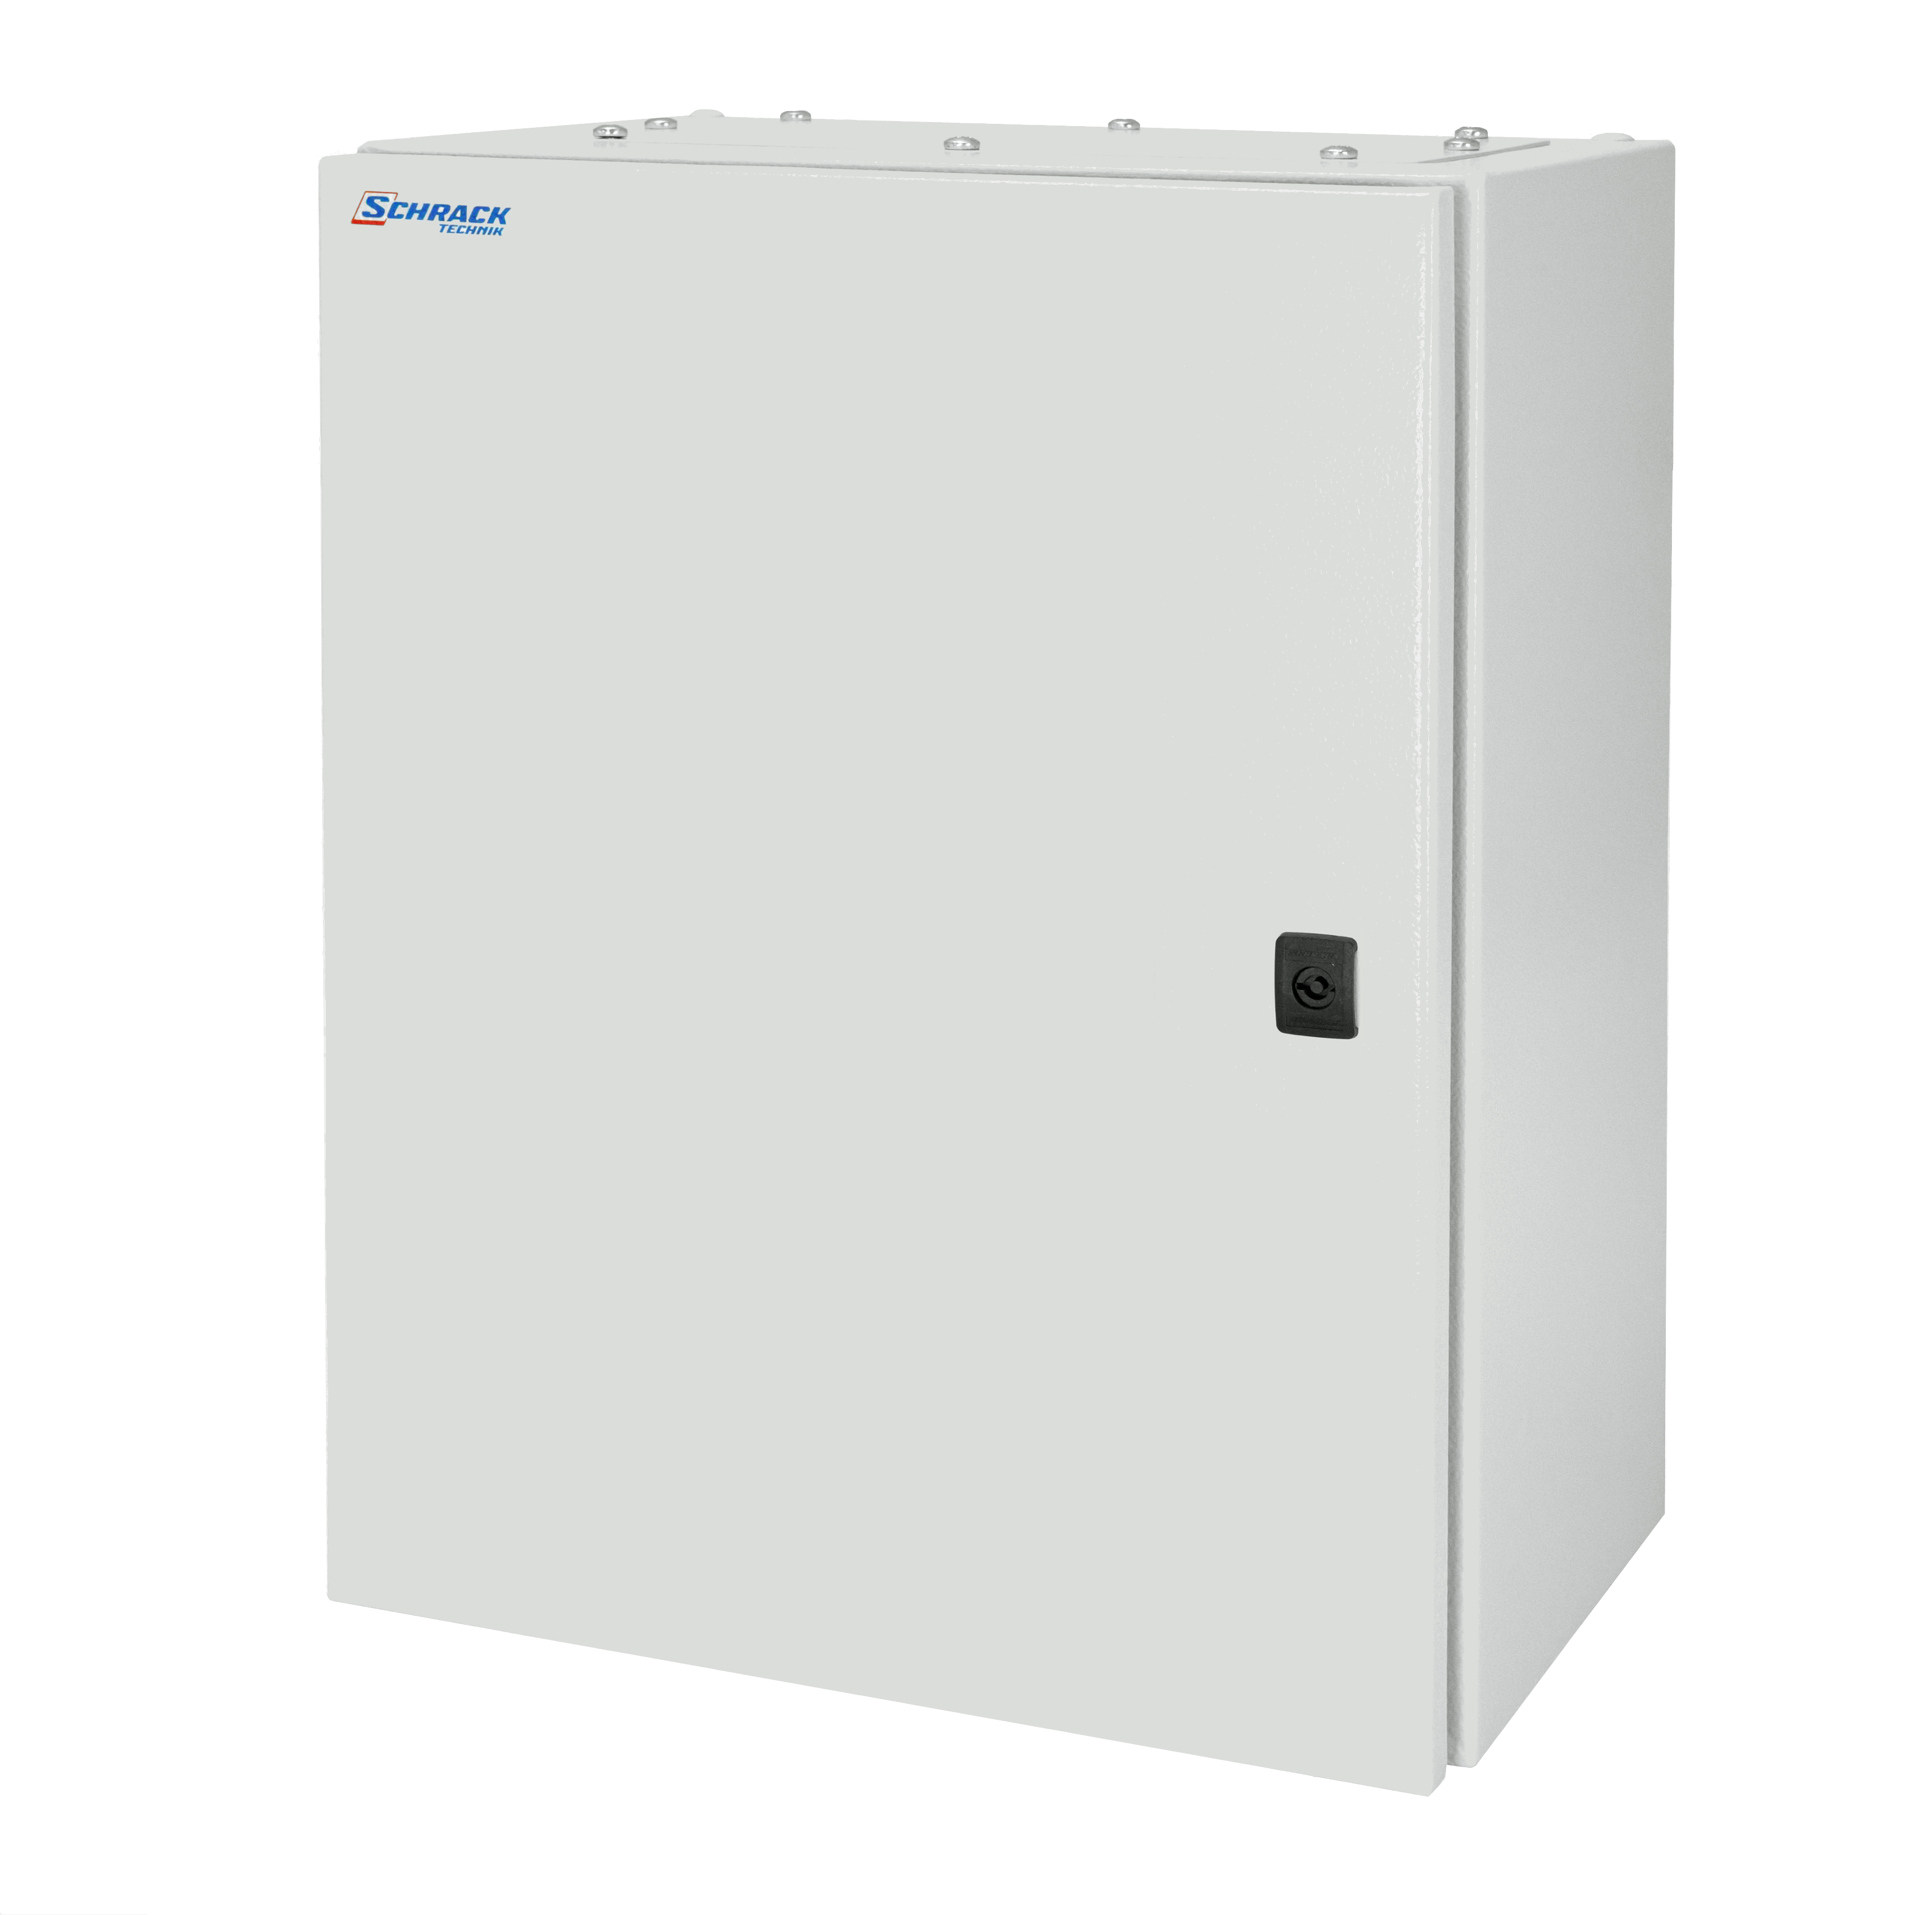 1 Stk Wandschrank Mono IP66 H=500 B=400 T=300 Stahlblech WSM5040300